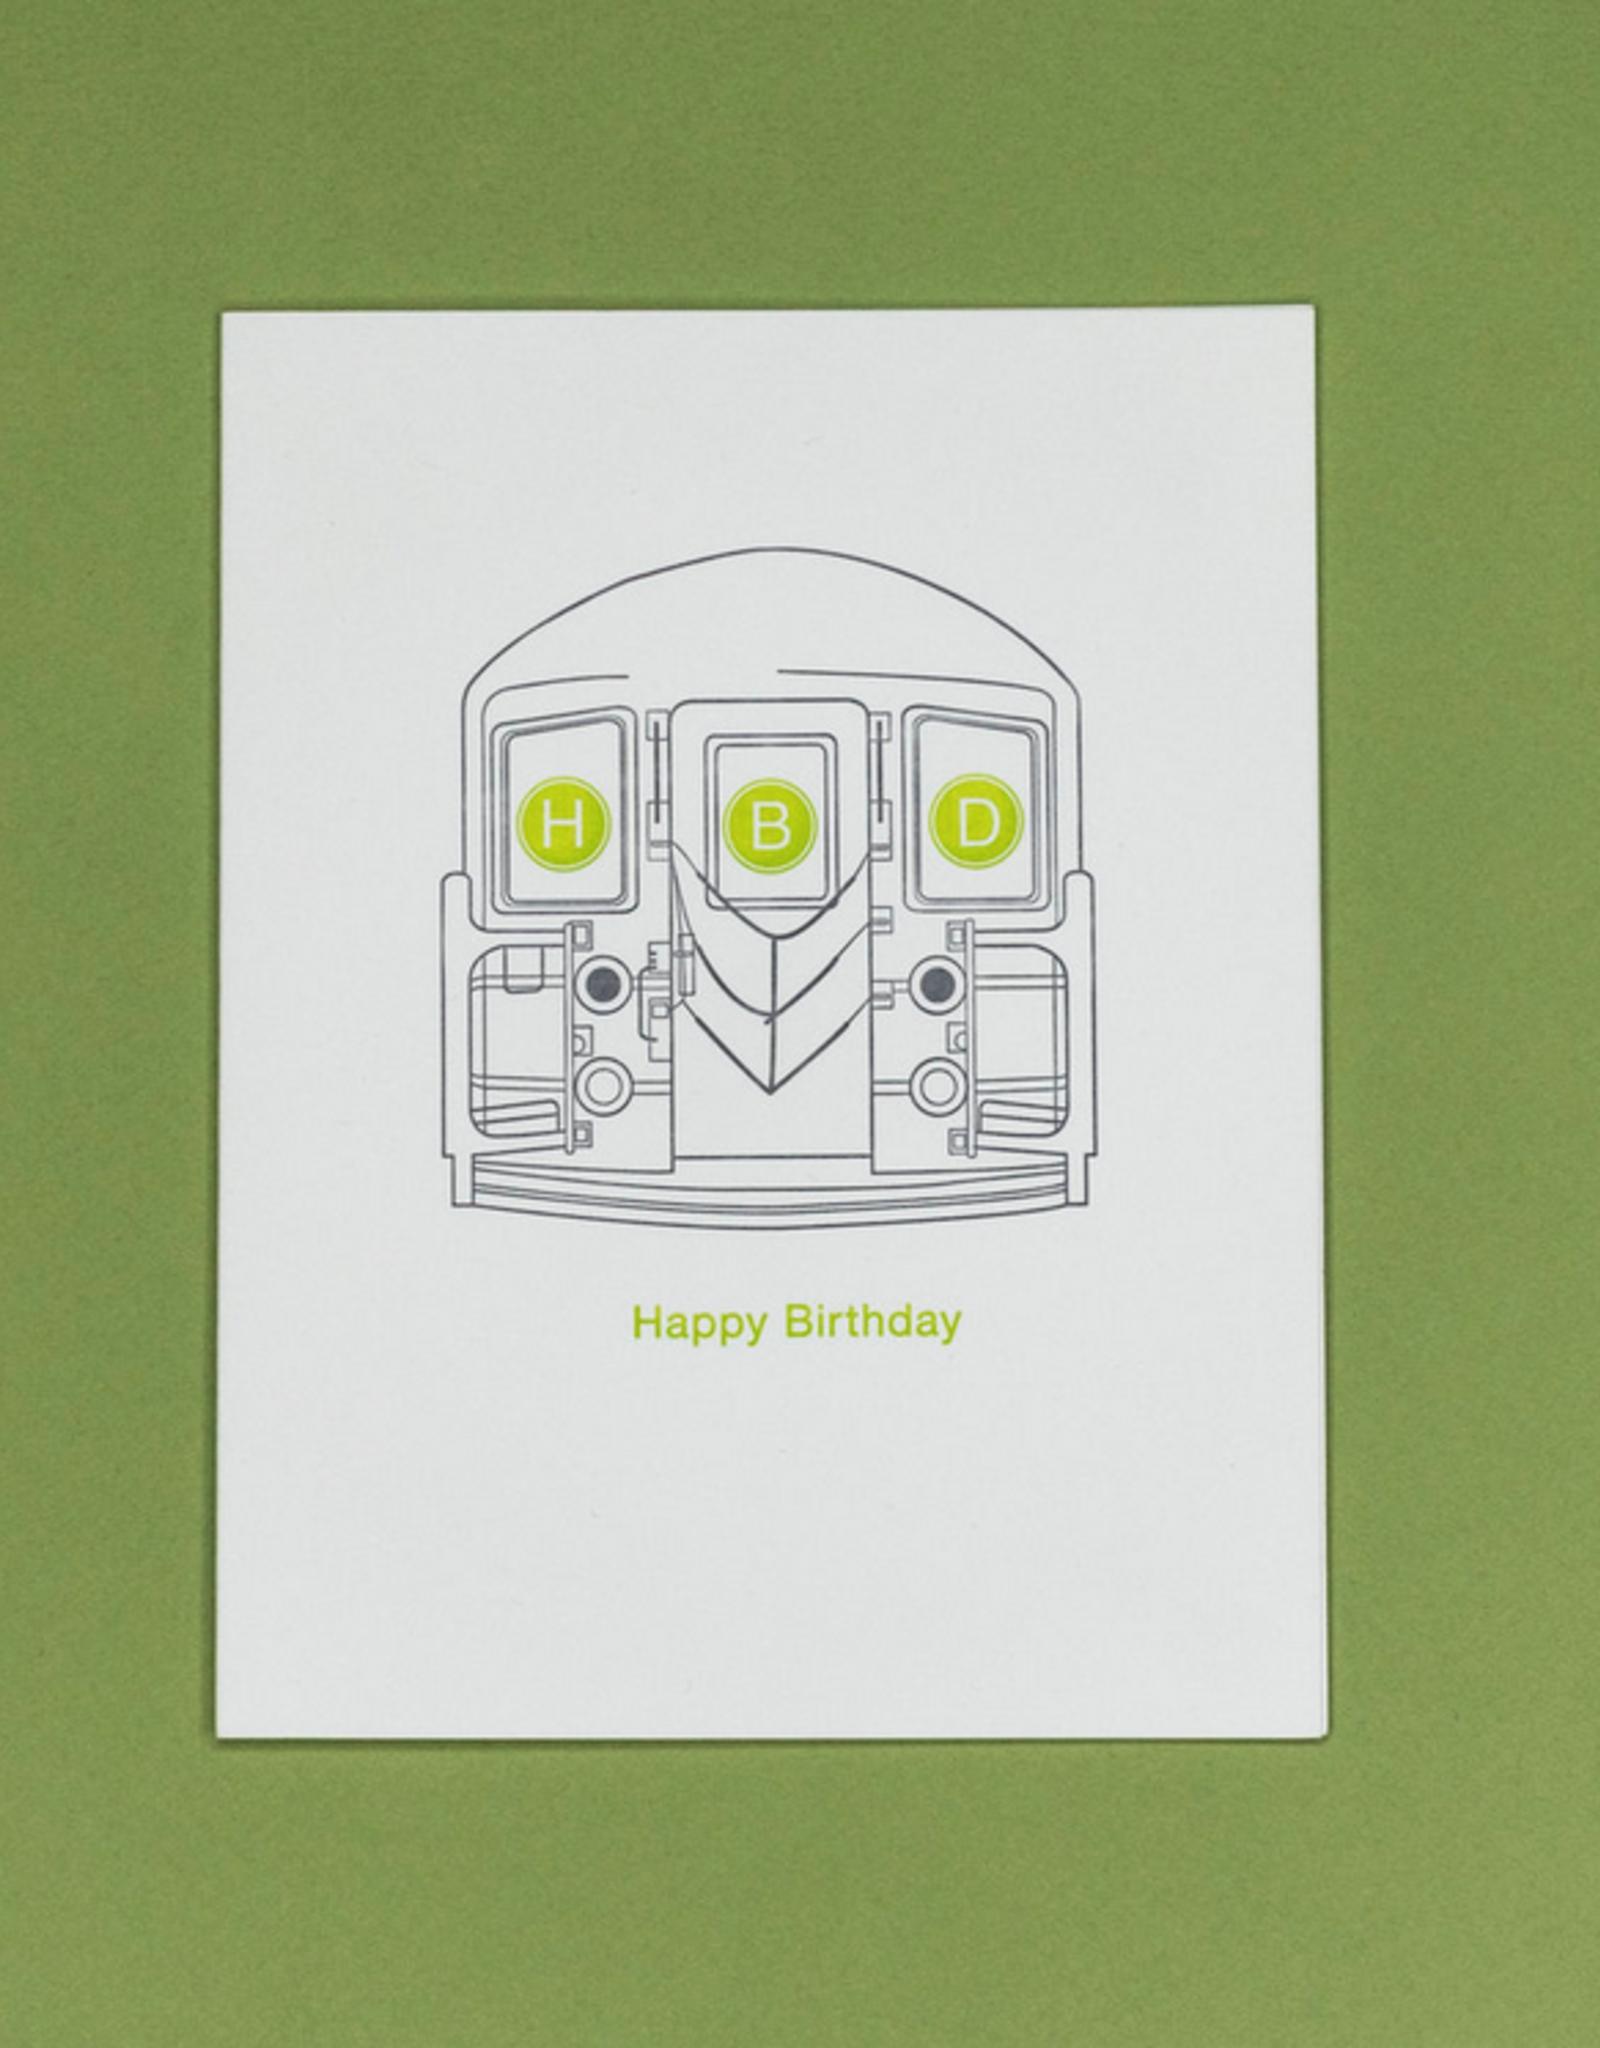 Quick Brown Fox Card - Birthday: HBD